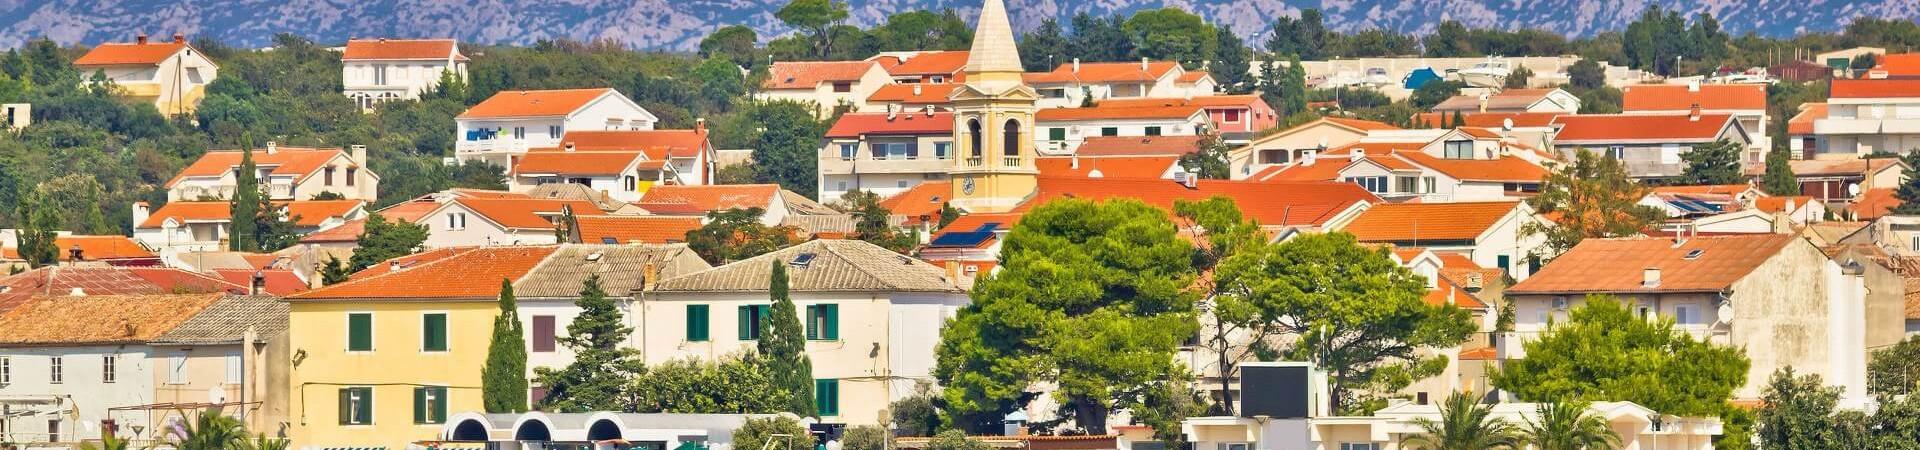 Chorwacja Novalja